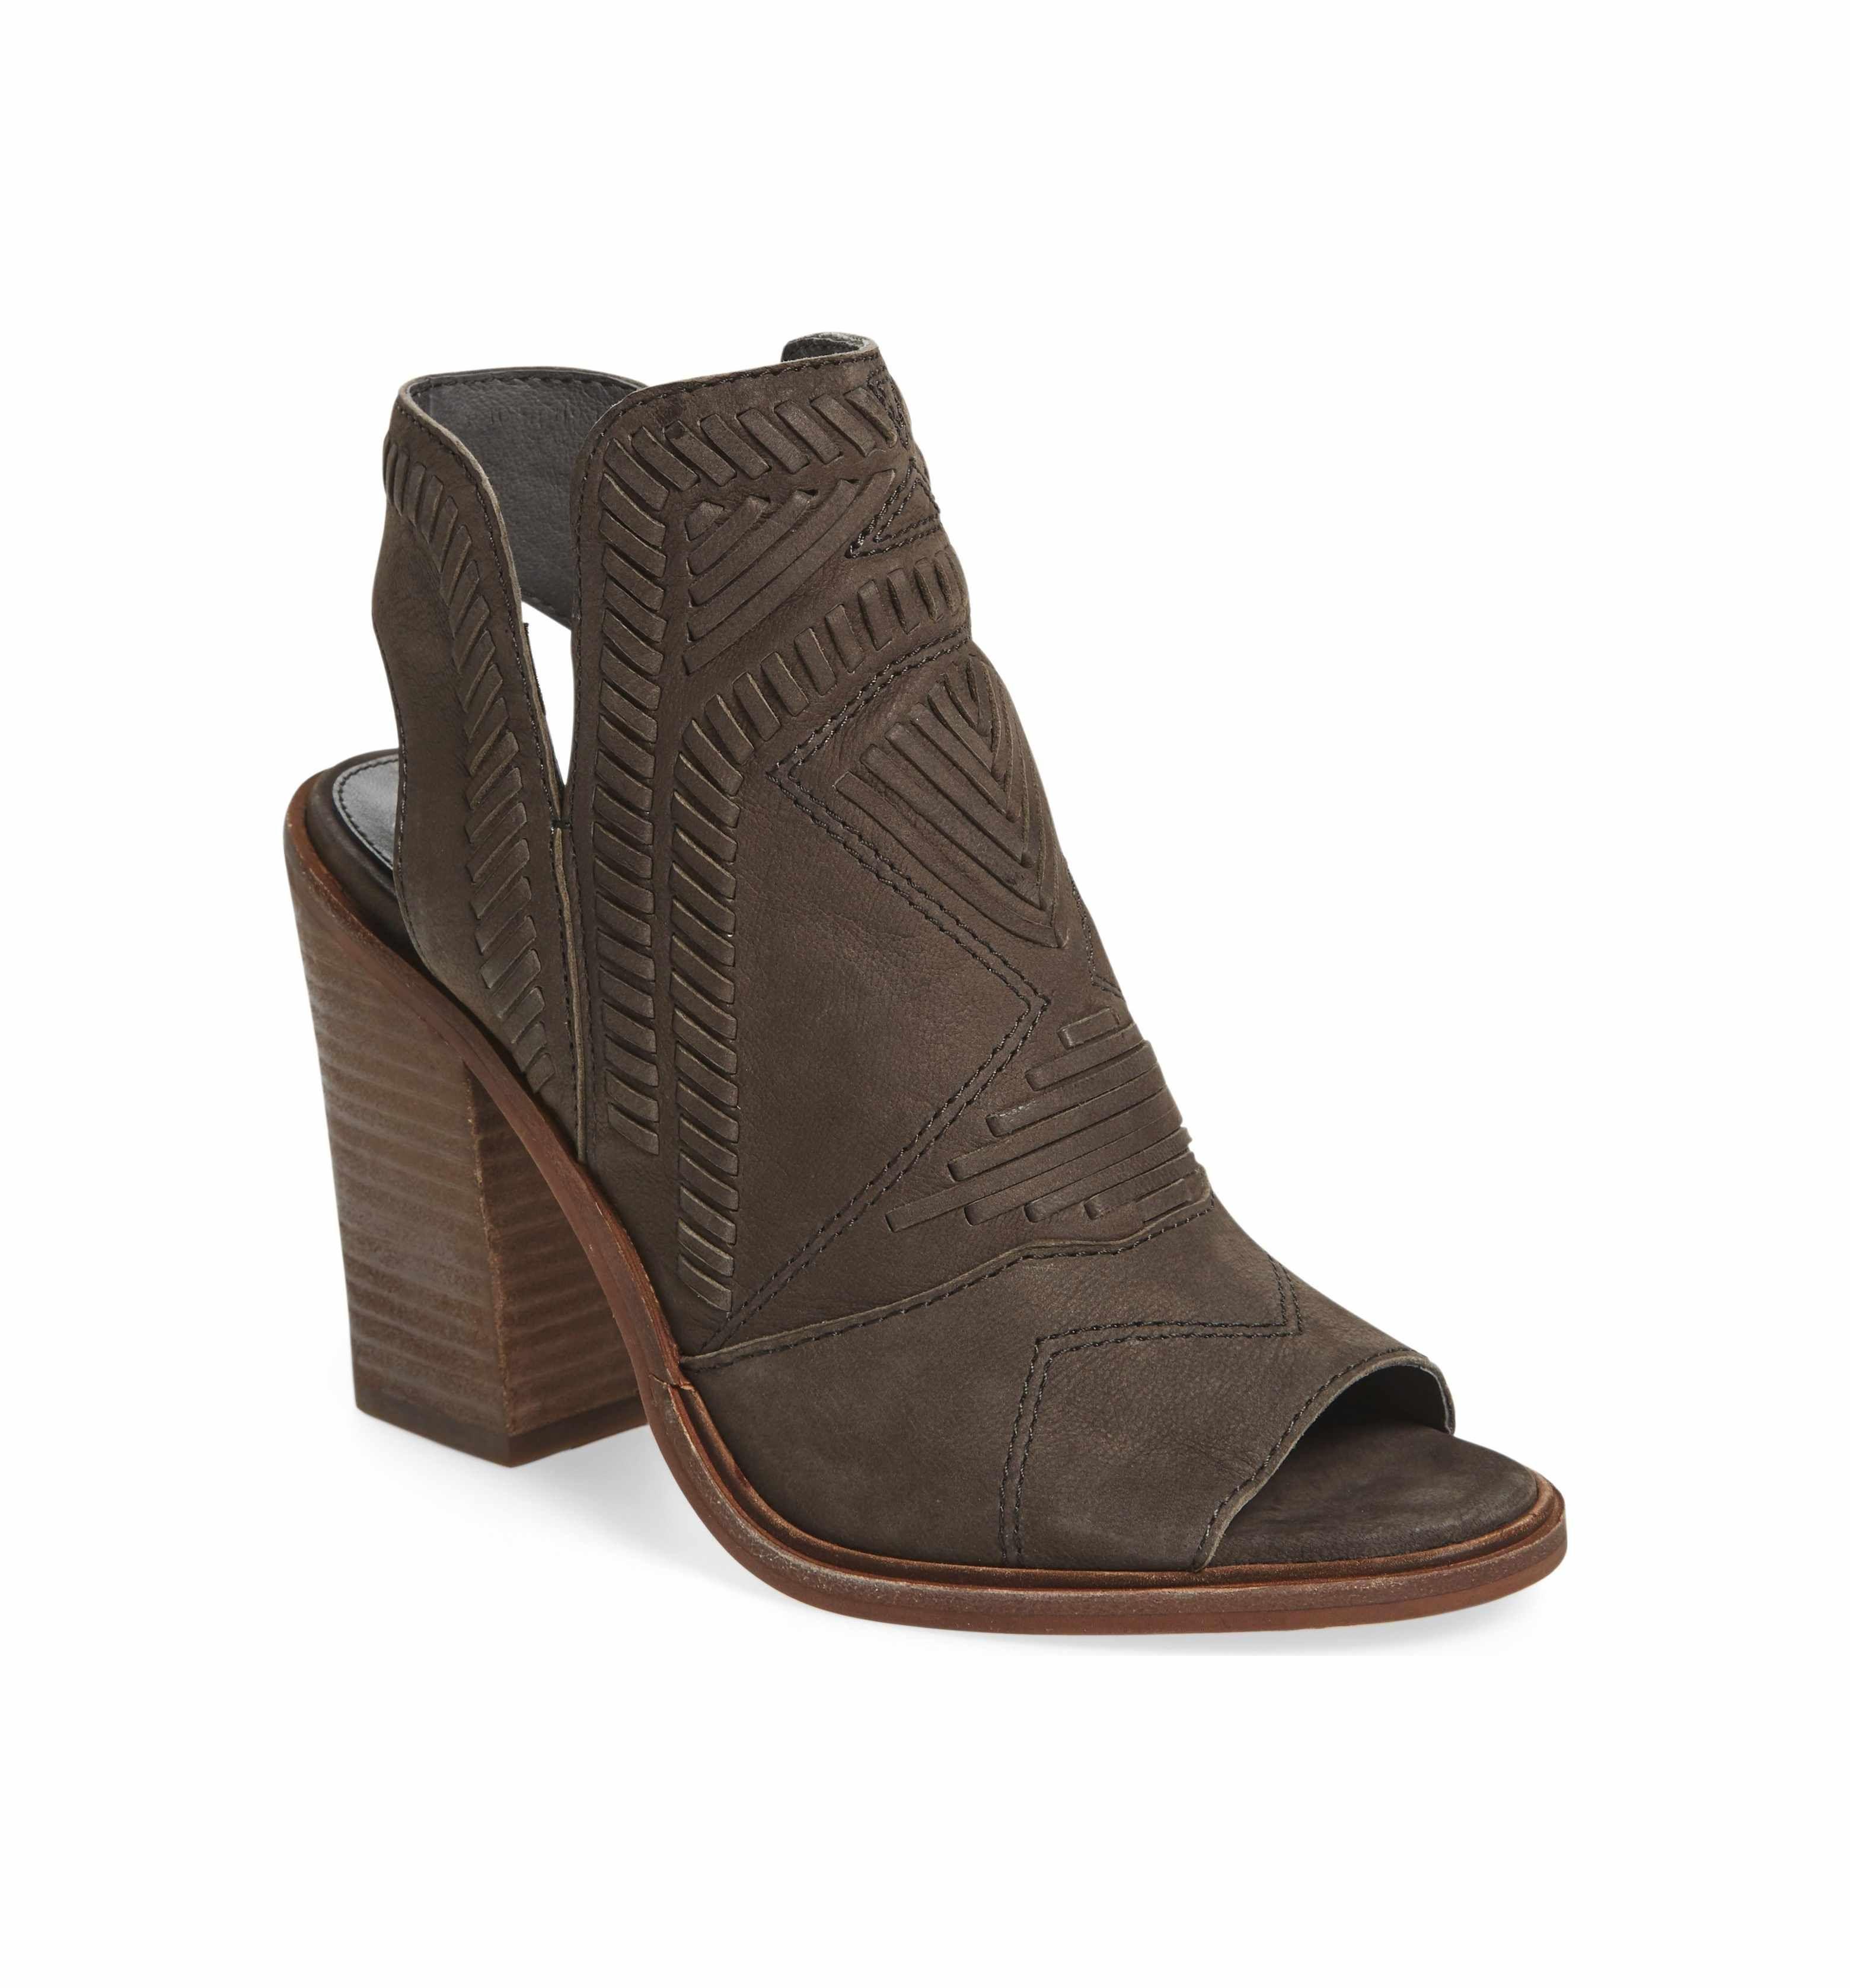 1e745e3df9 150 Main Image - Vince Camuto Karinta Block Heel Bootie (Women ...